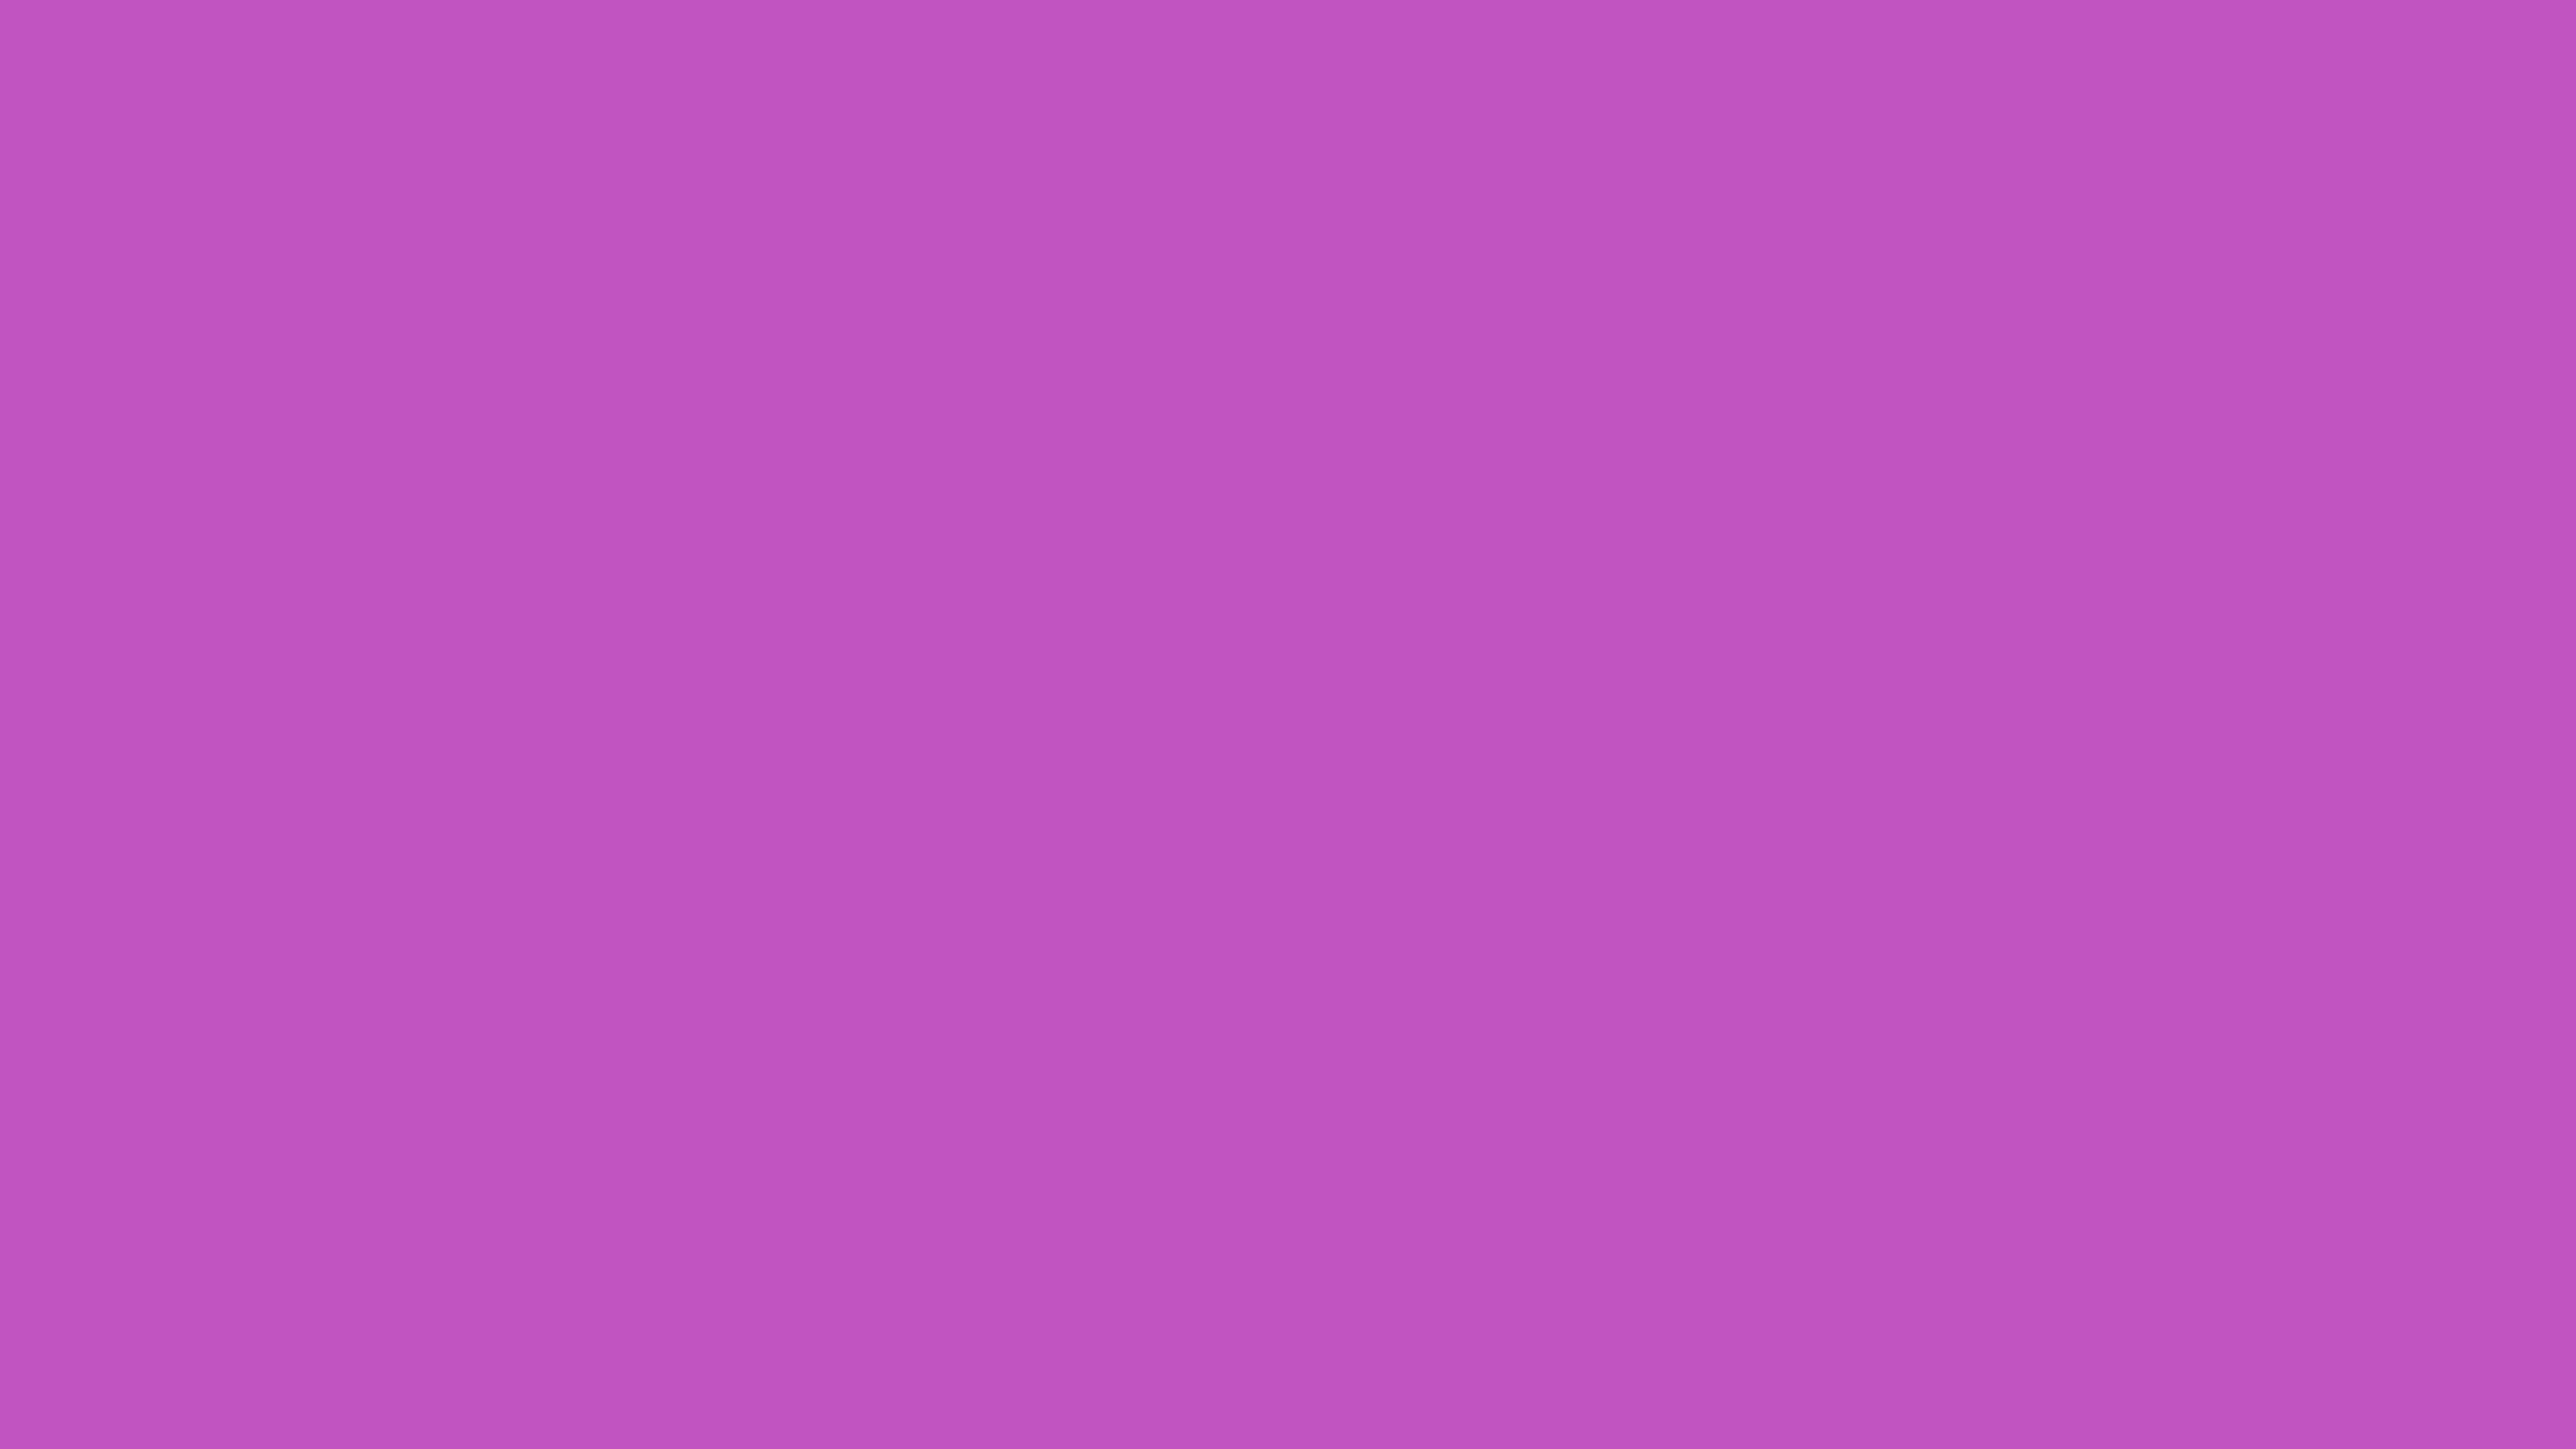 4096x2304 Fuchsia Crayola Solid Color Background